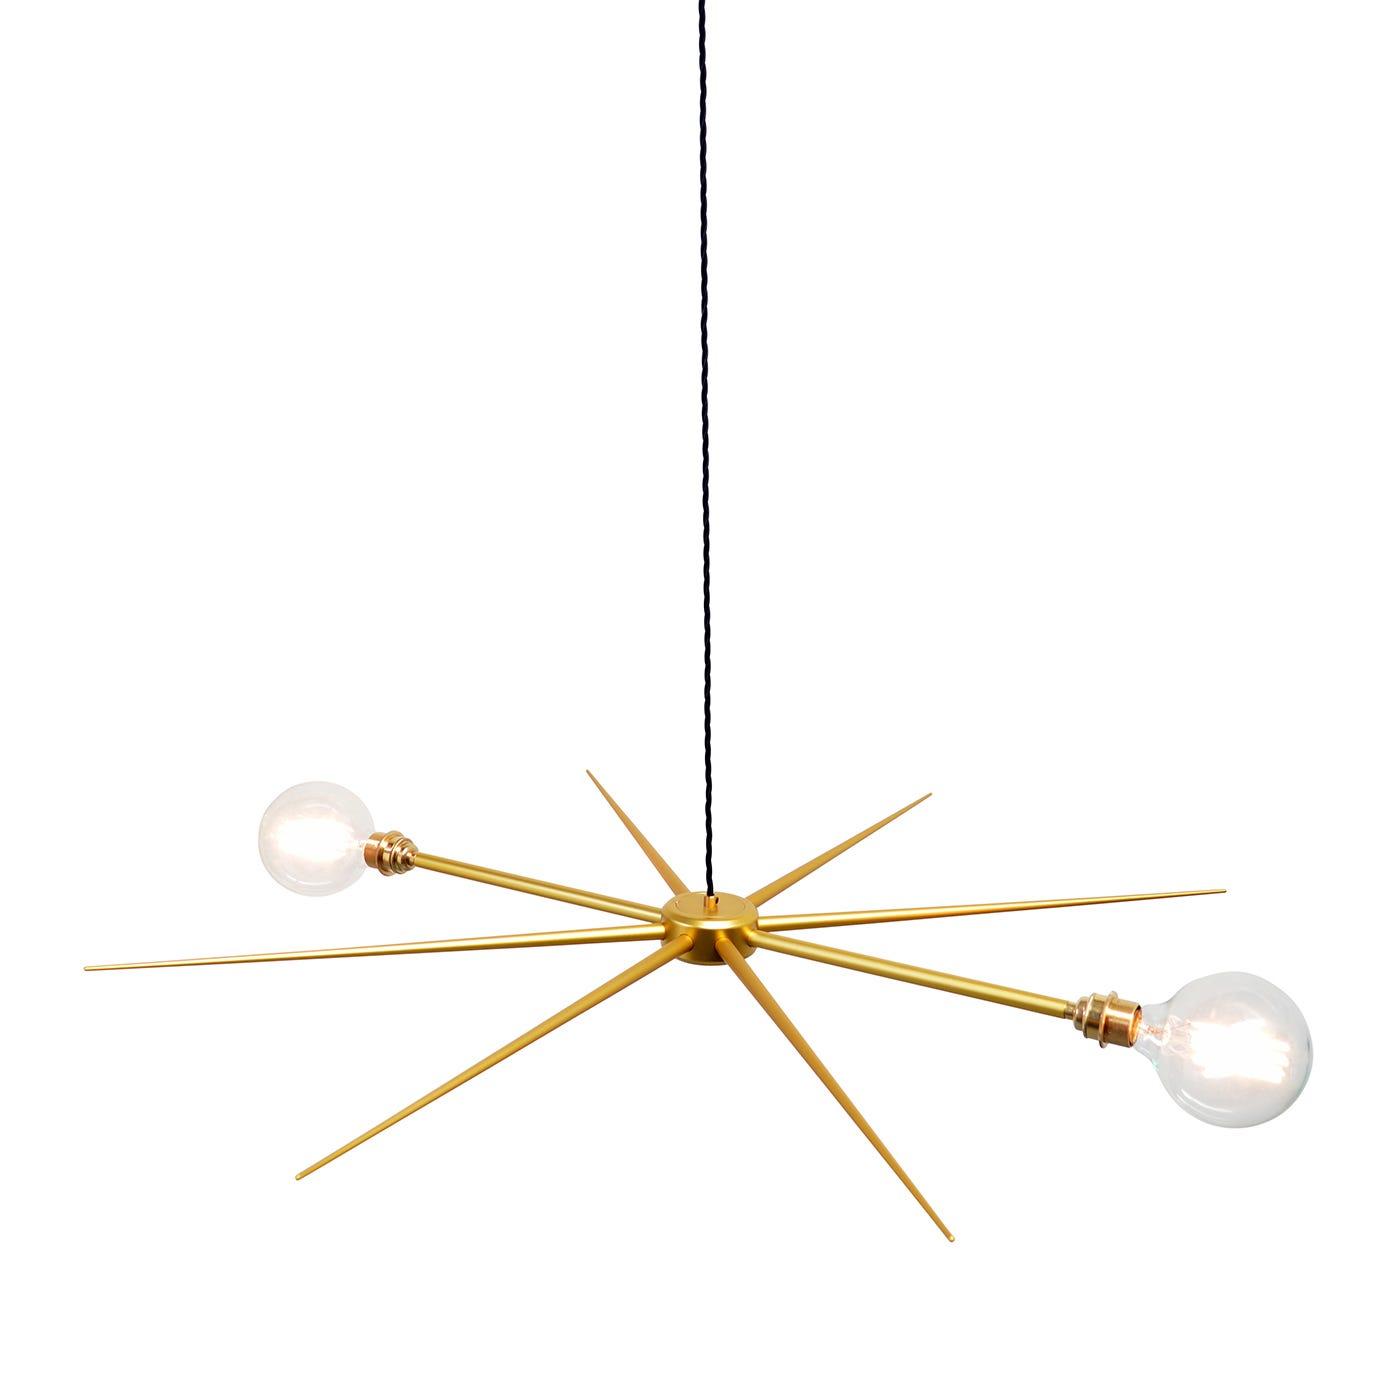 Vega 8- 2 Globe Filament Chandelier